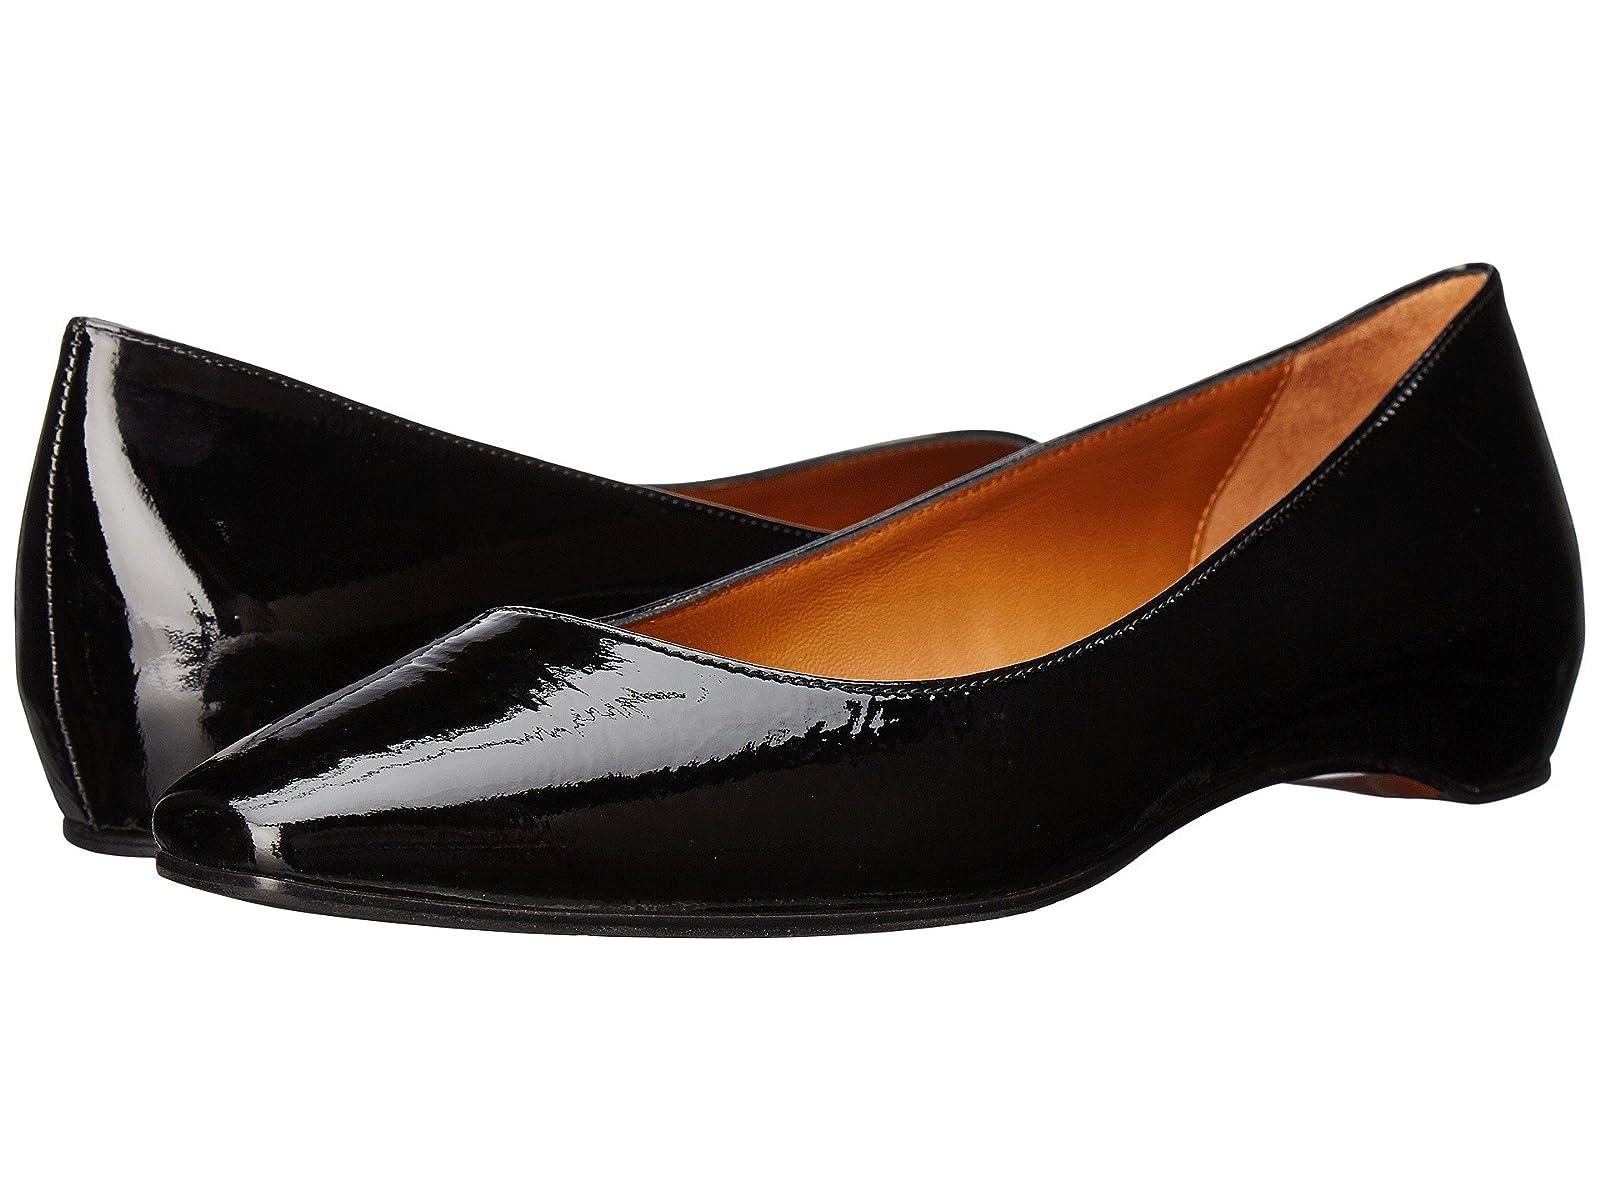 Aquatalia MarcellaCheap and distinctive eye-catching shoes